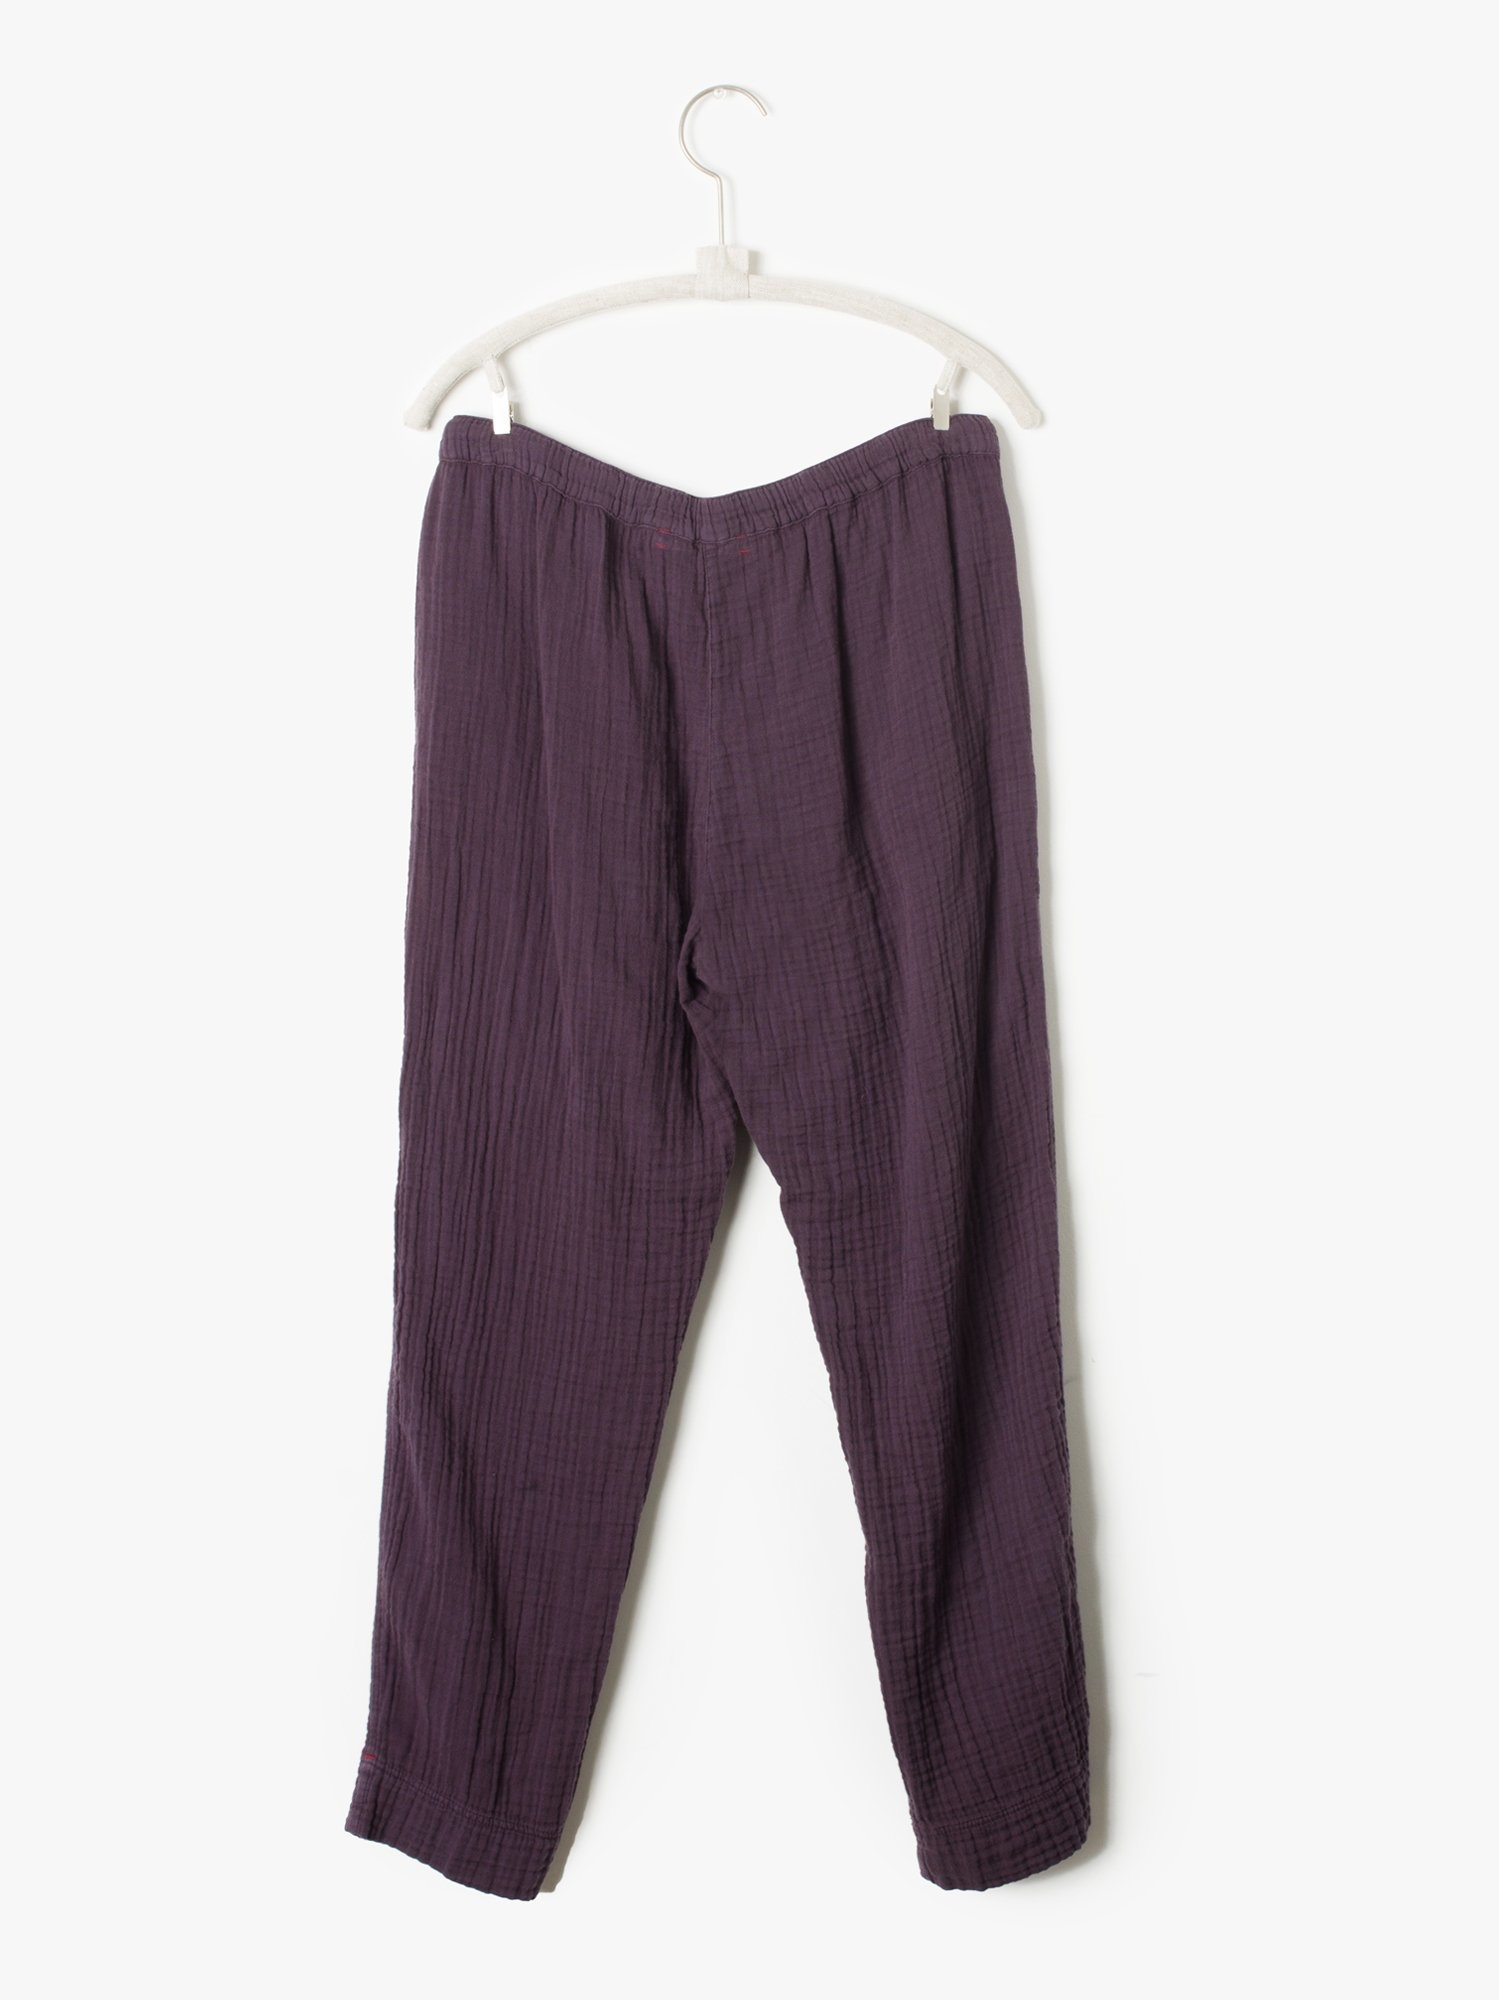 Xirena Cotton Gauze Drawstring Pant